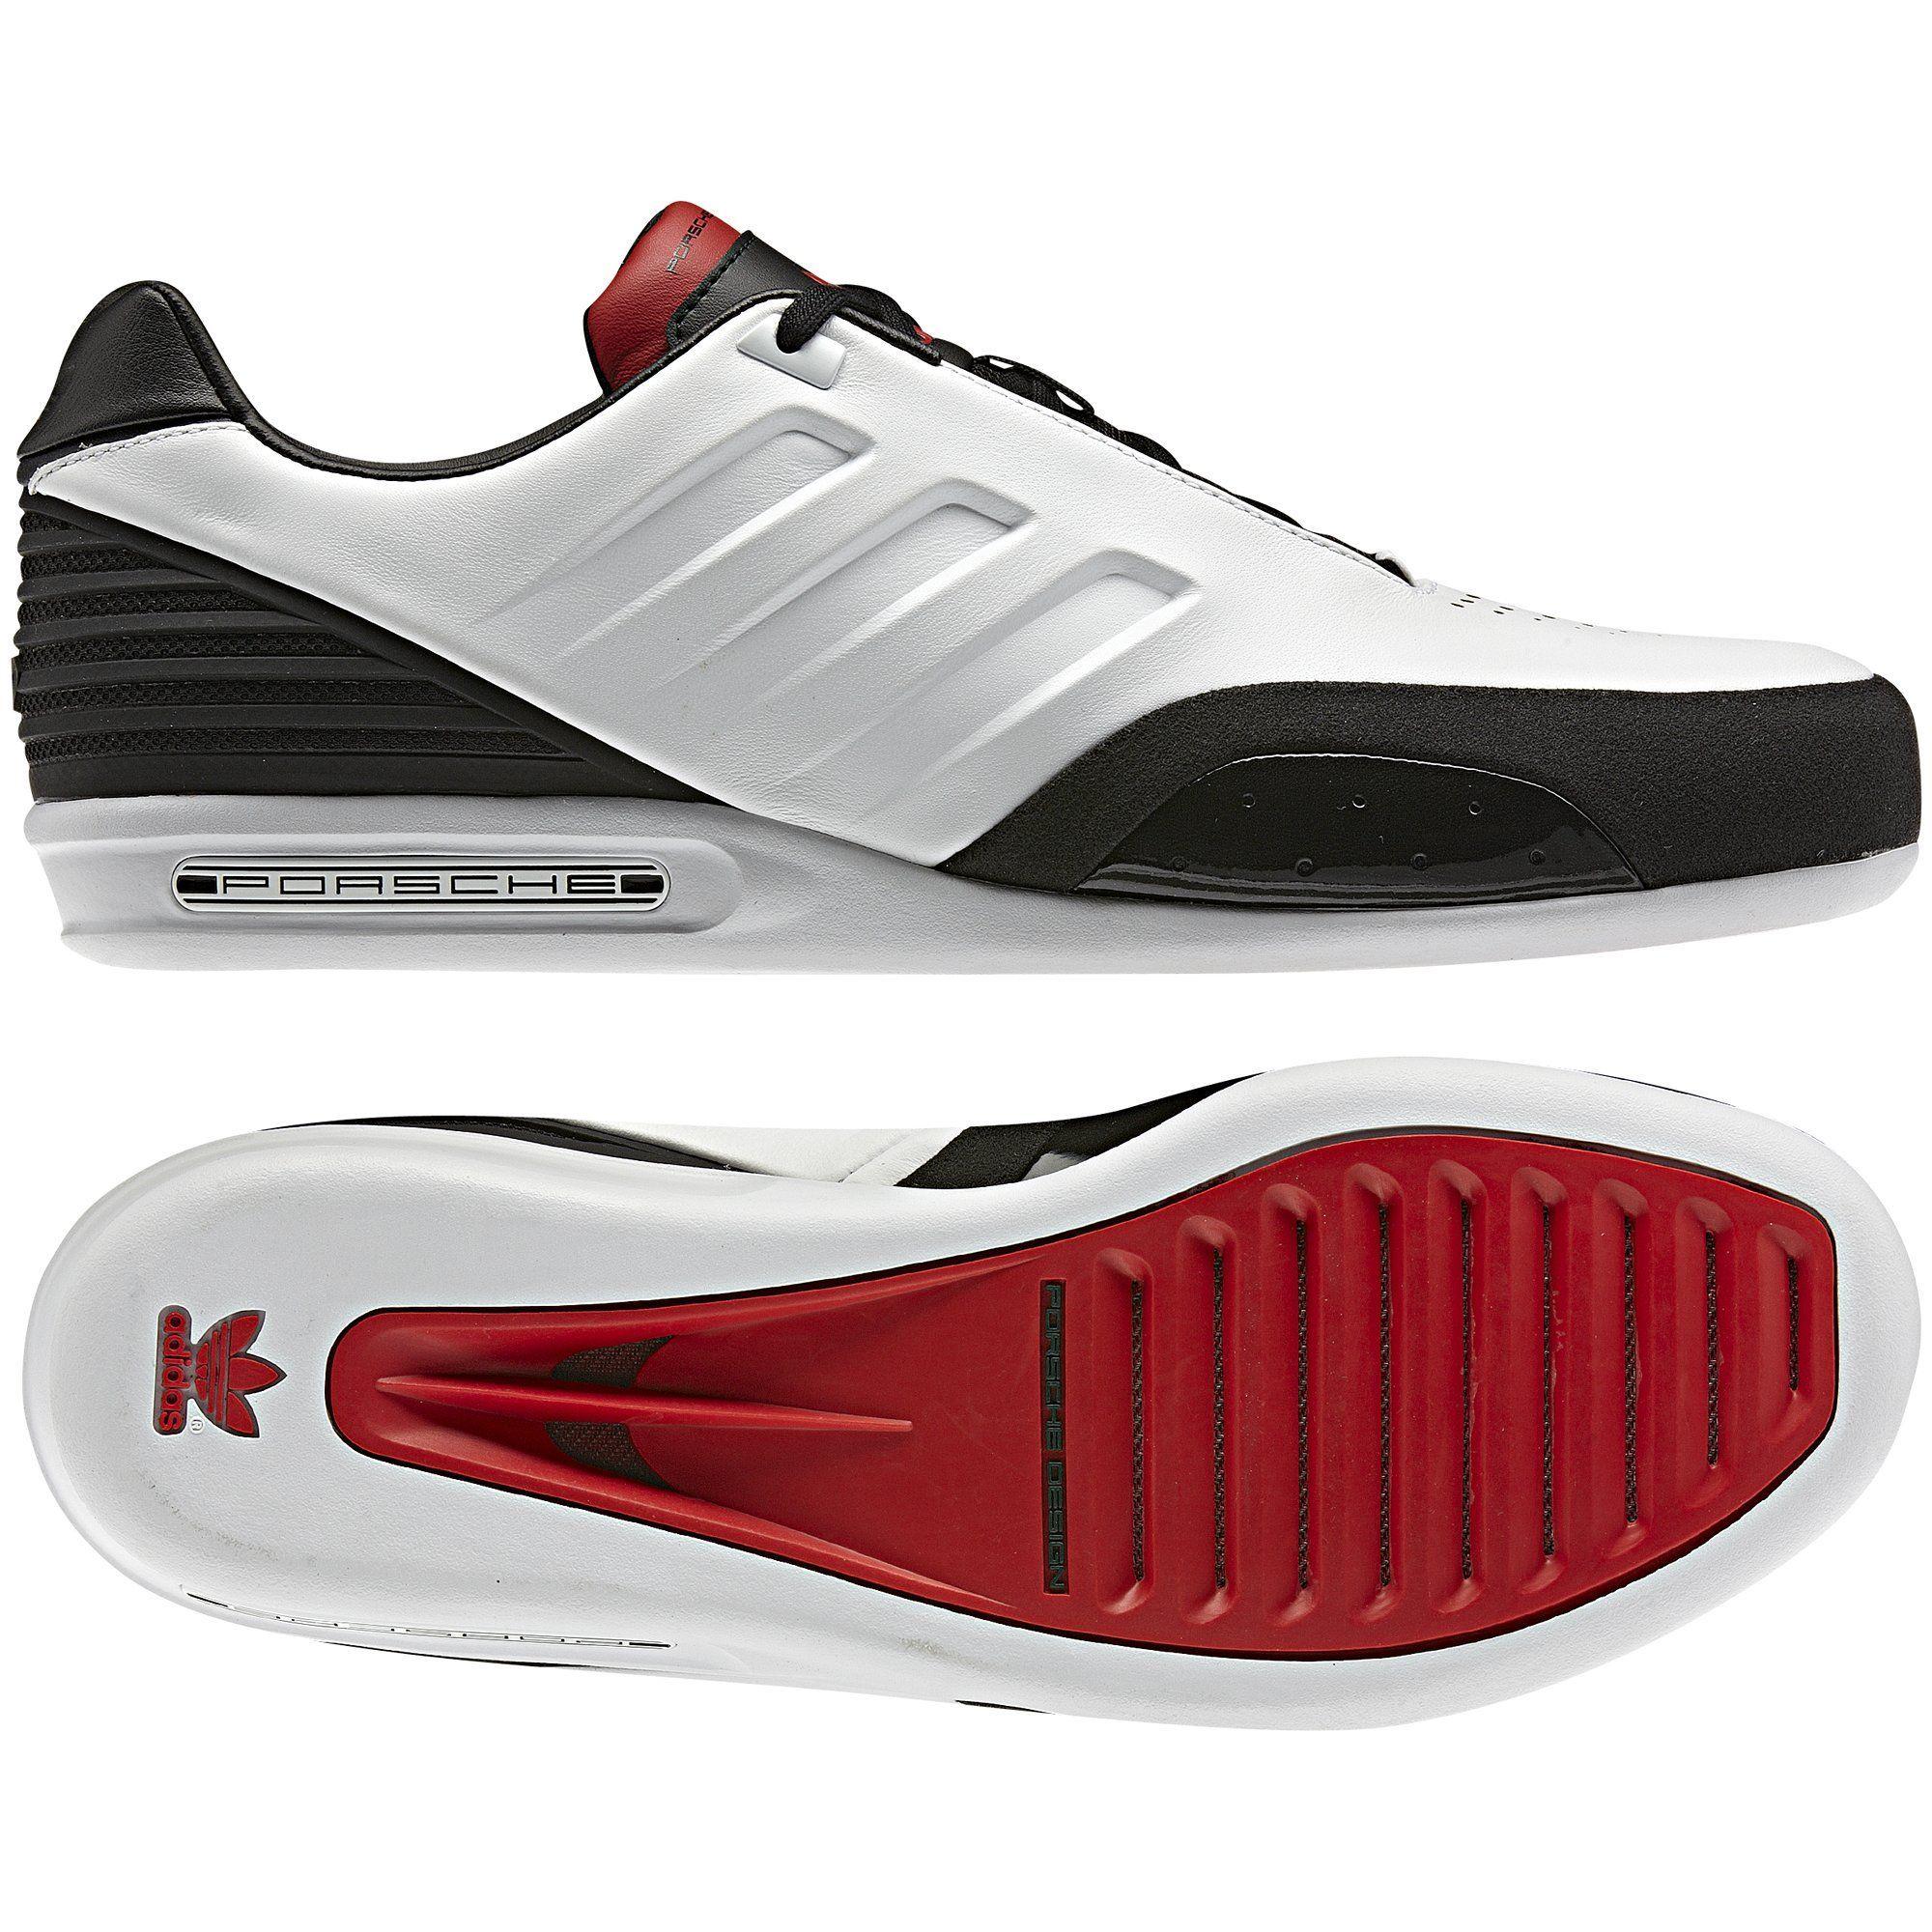 Adidas EQT Support 93 Berlin F&F Friends & Family EU40 US7